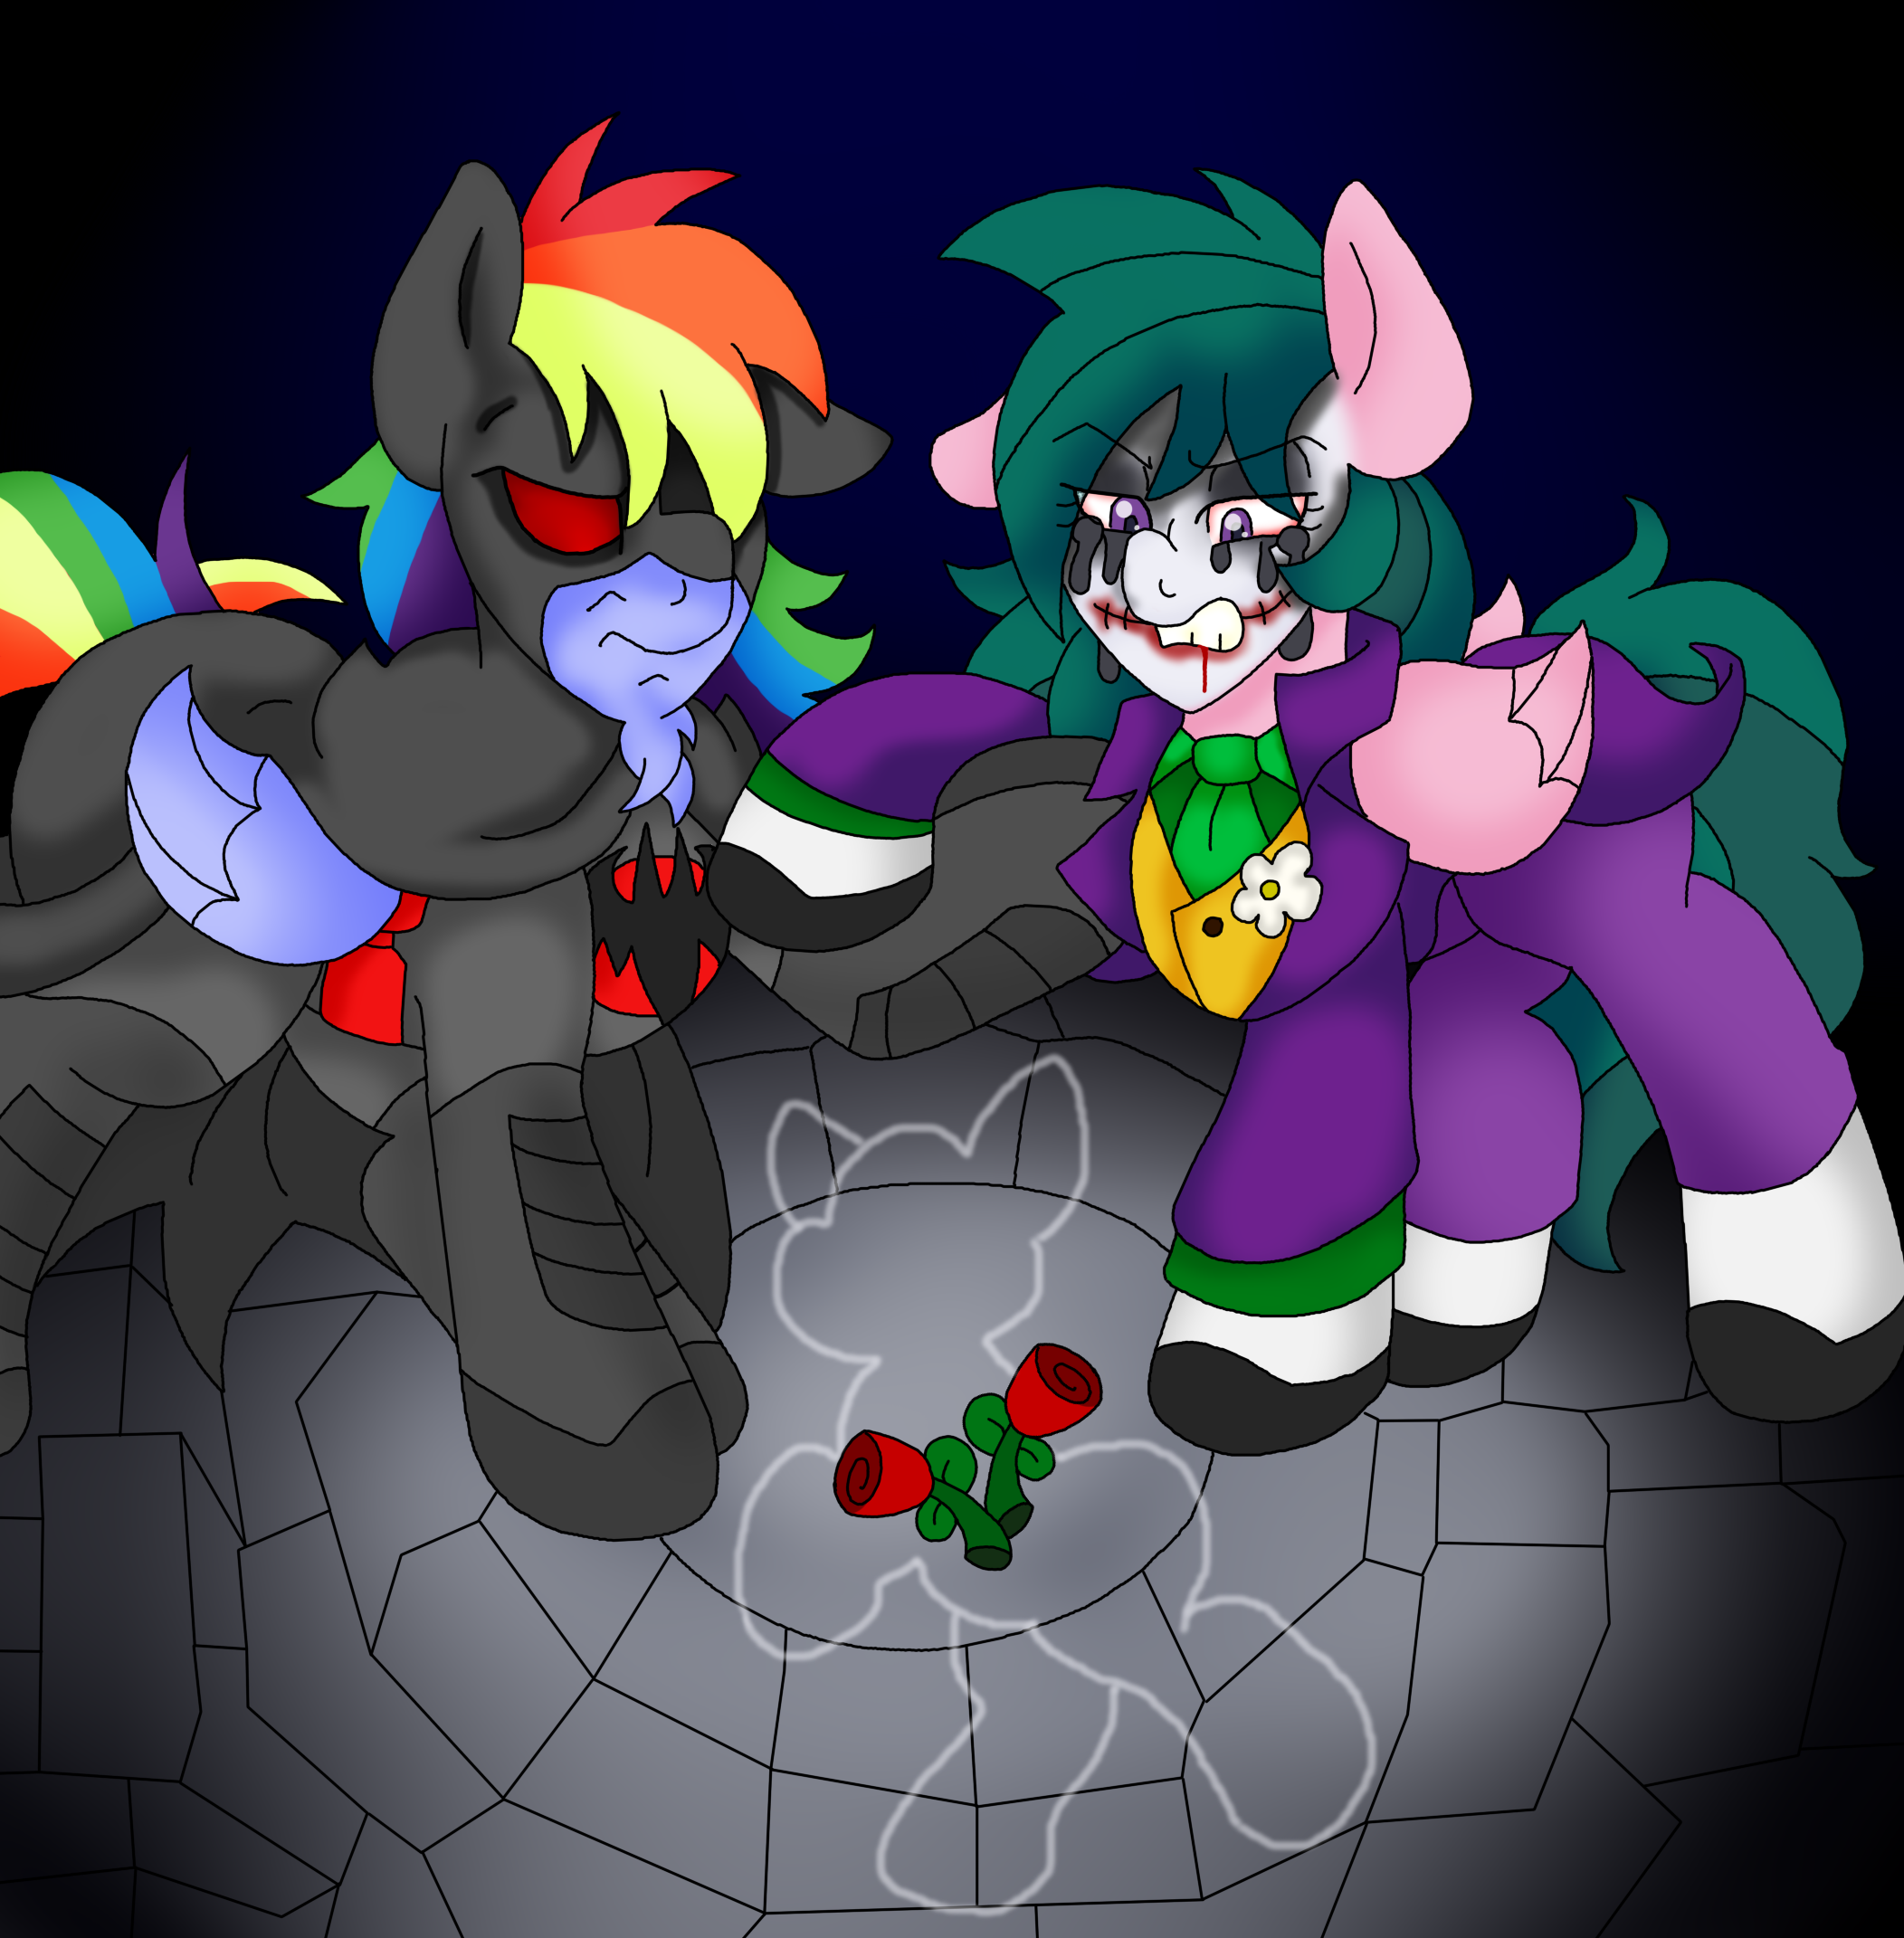 Rainbow Dash Batman Wallpaper by ALoopyDuck on DeviantArt  |Batman Rainbow Dash